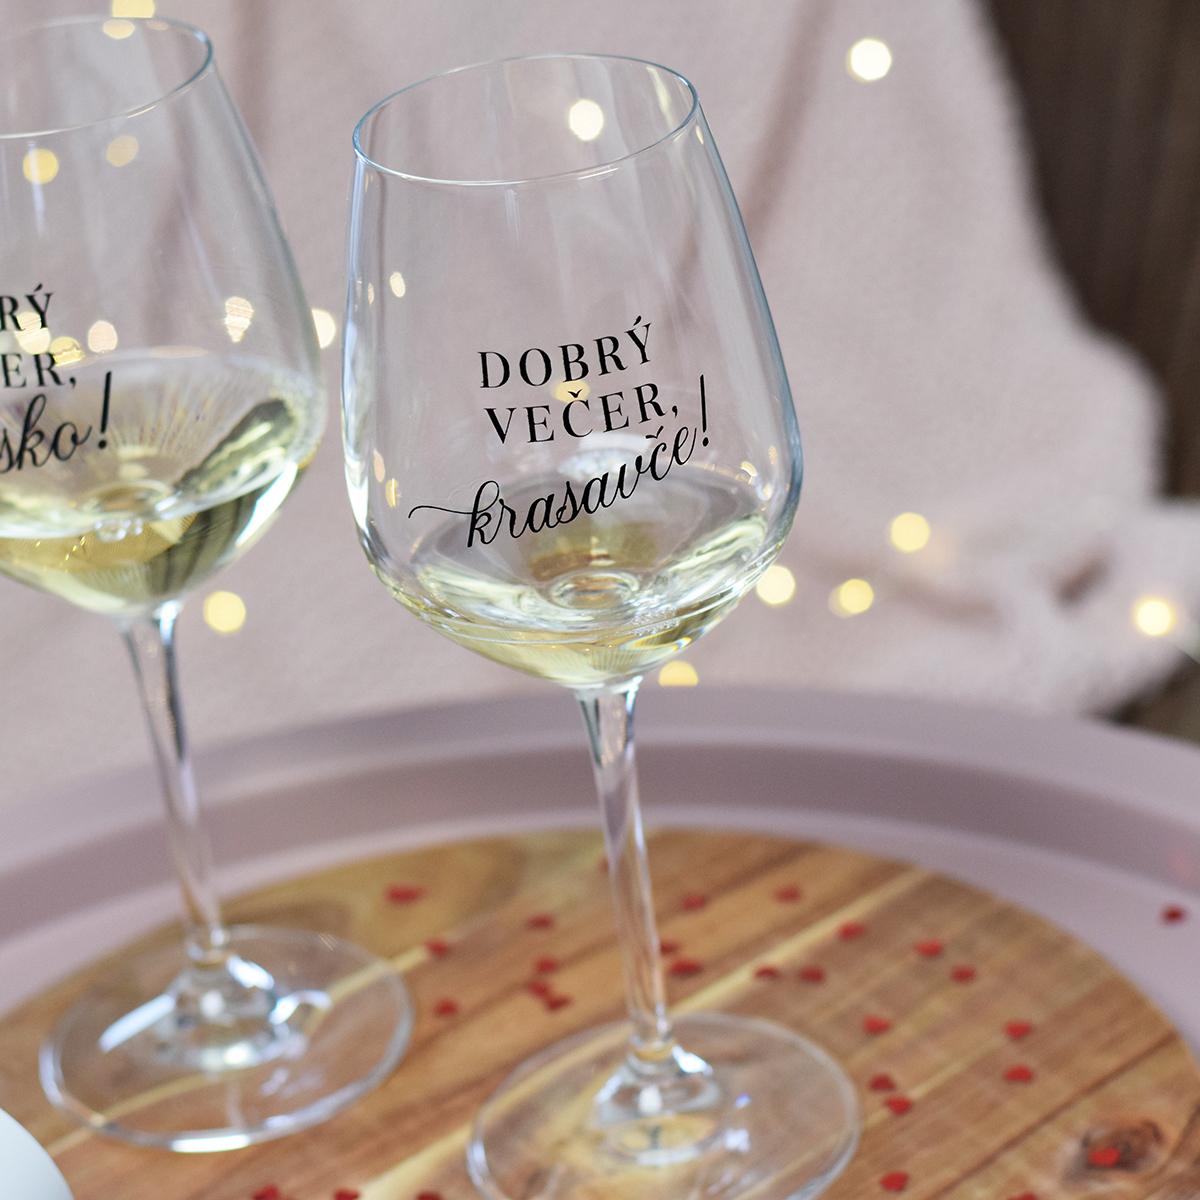 HOUSEDECOR Sklenice na víno - Dobrý večer, krasavče!